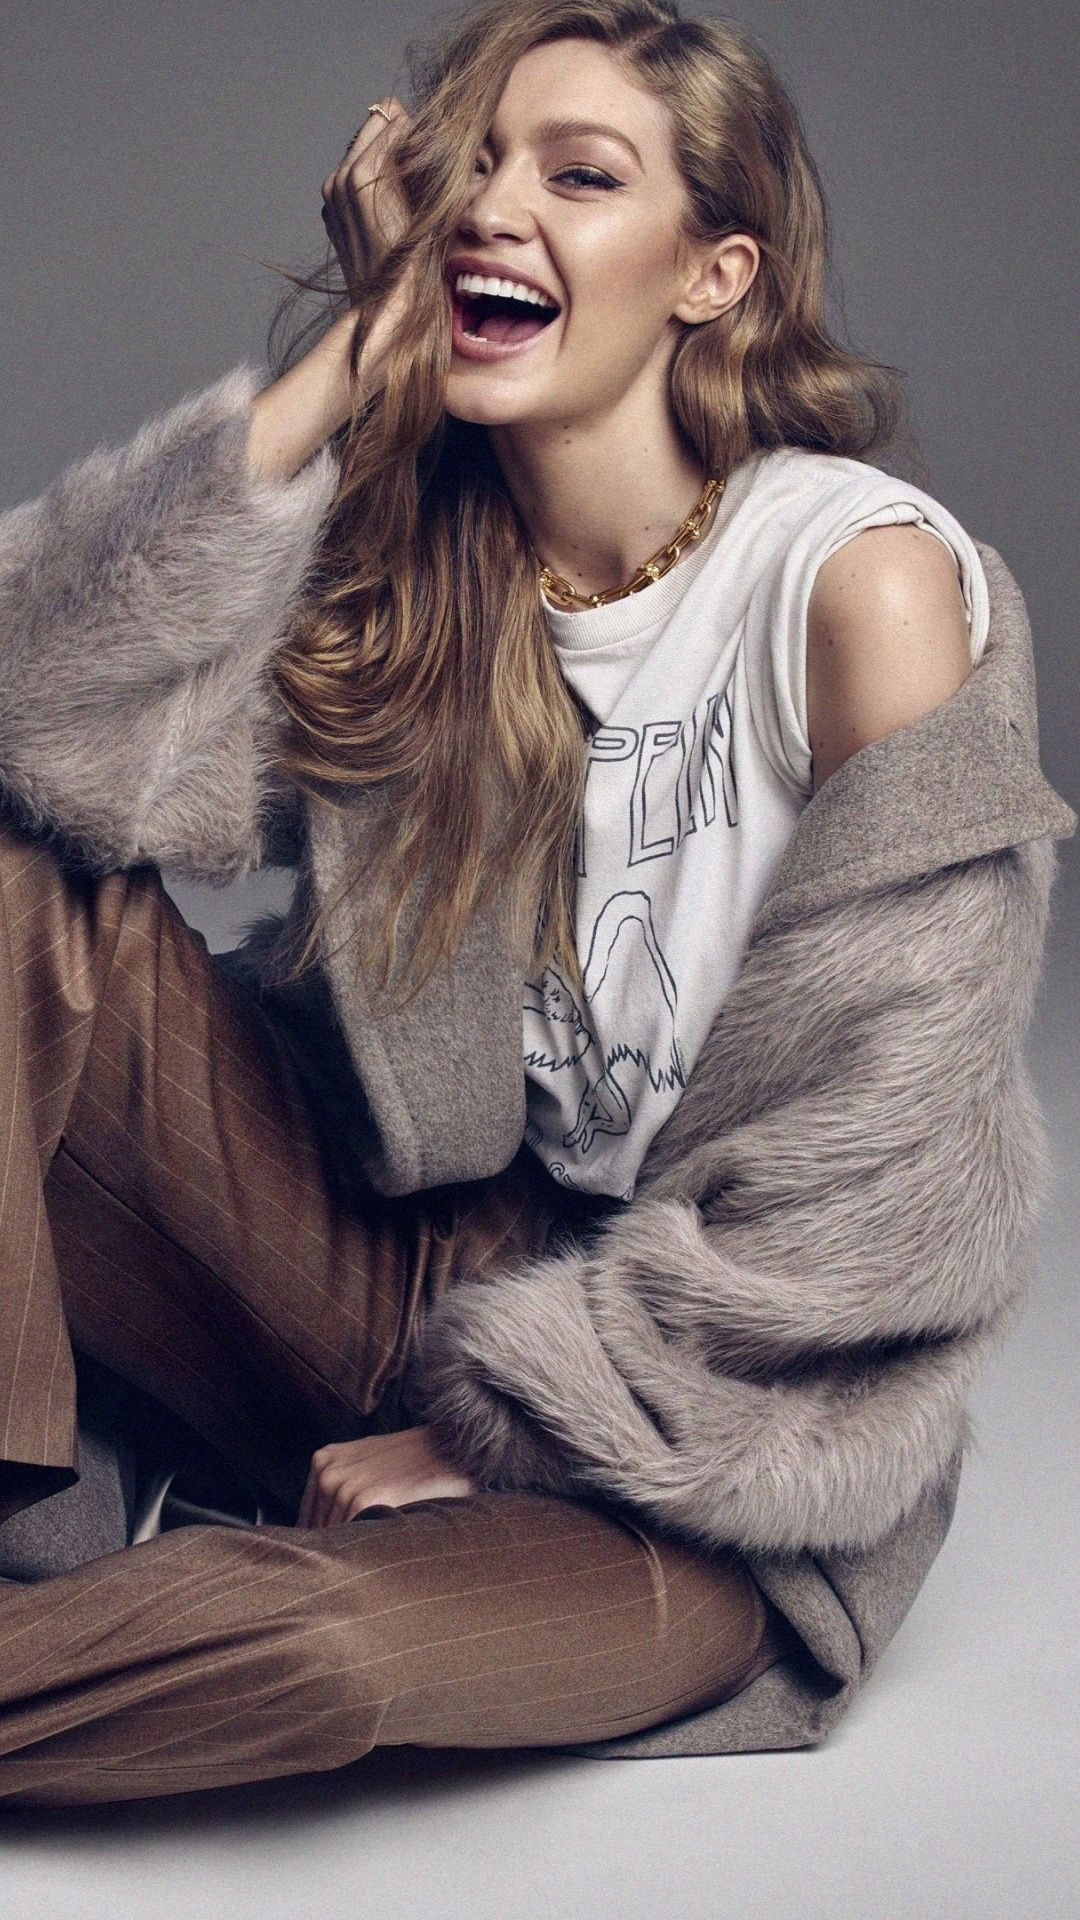 Gigi Hadid, supermodel, smile wallpaper #gigihadid